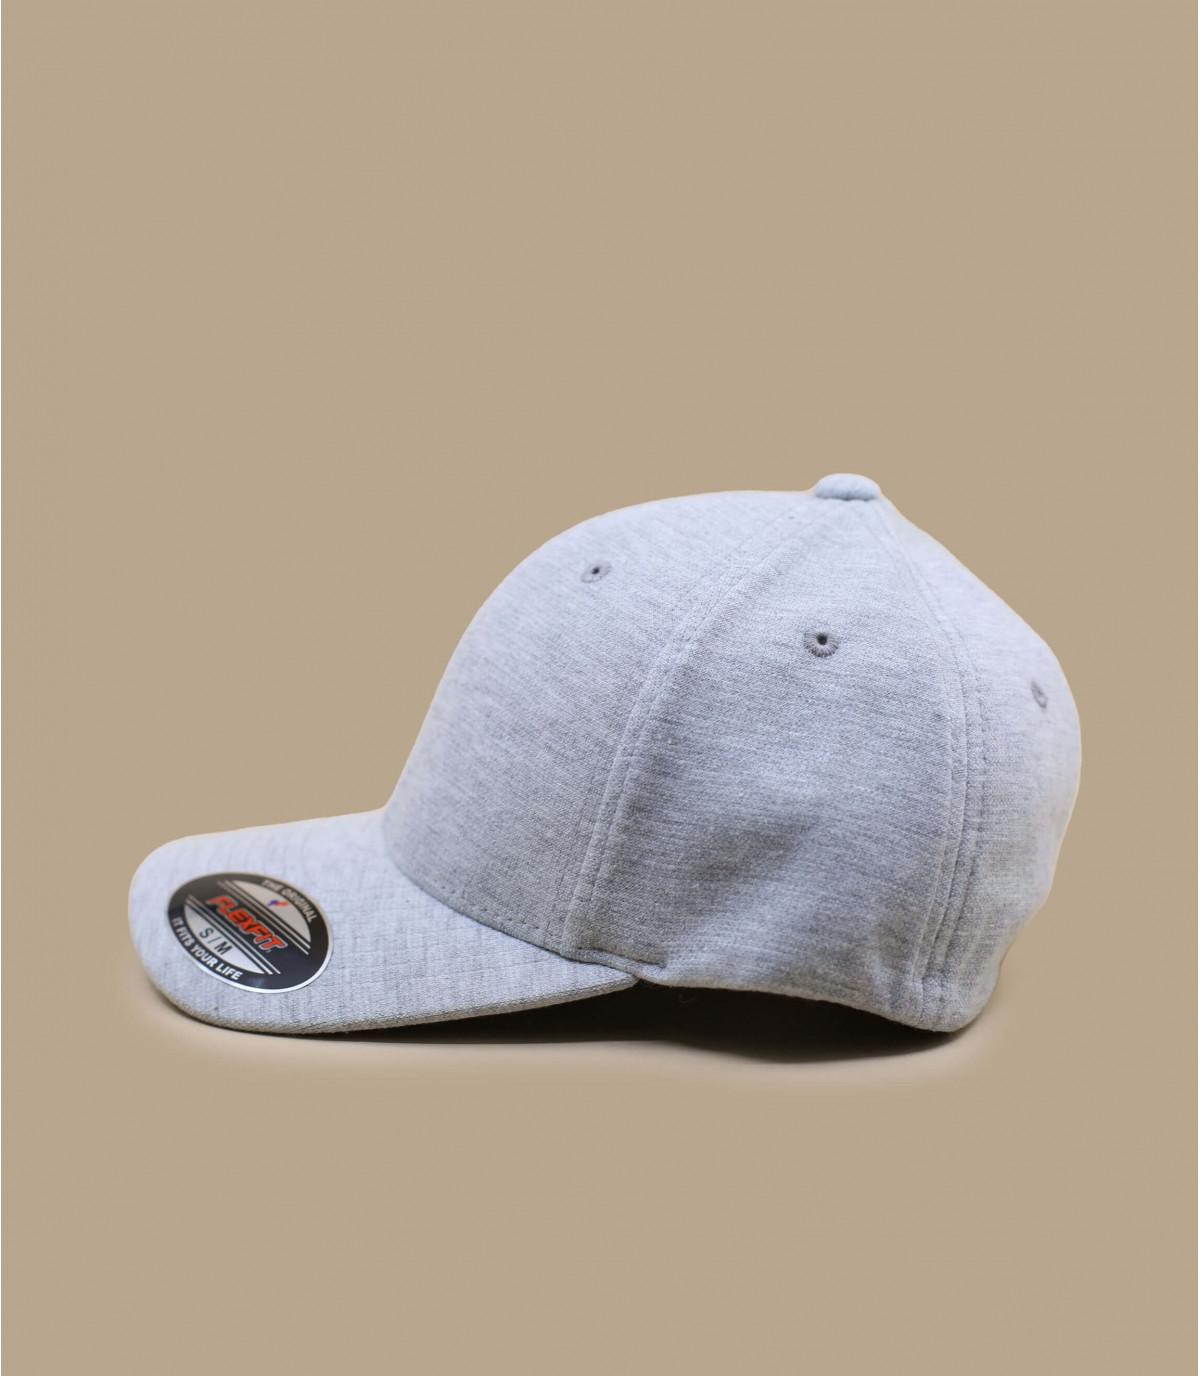 casquette jersey grise